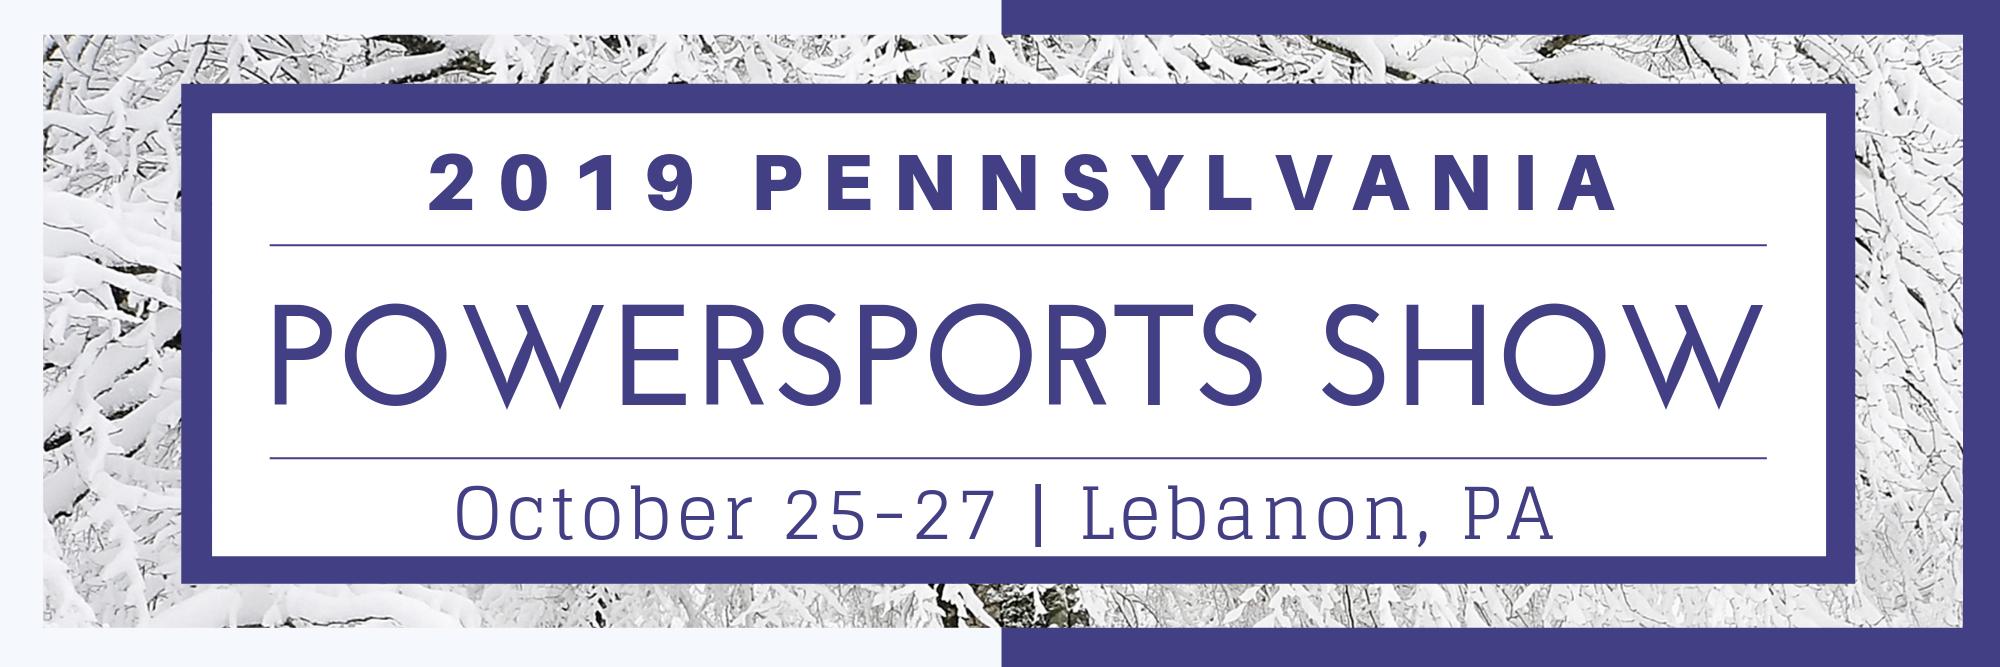 PA Powersports Show 2019 - PA State Snowmobile Association